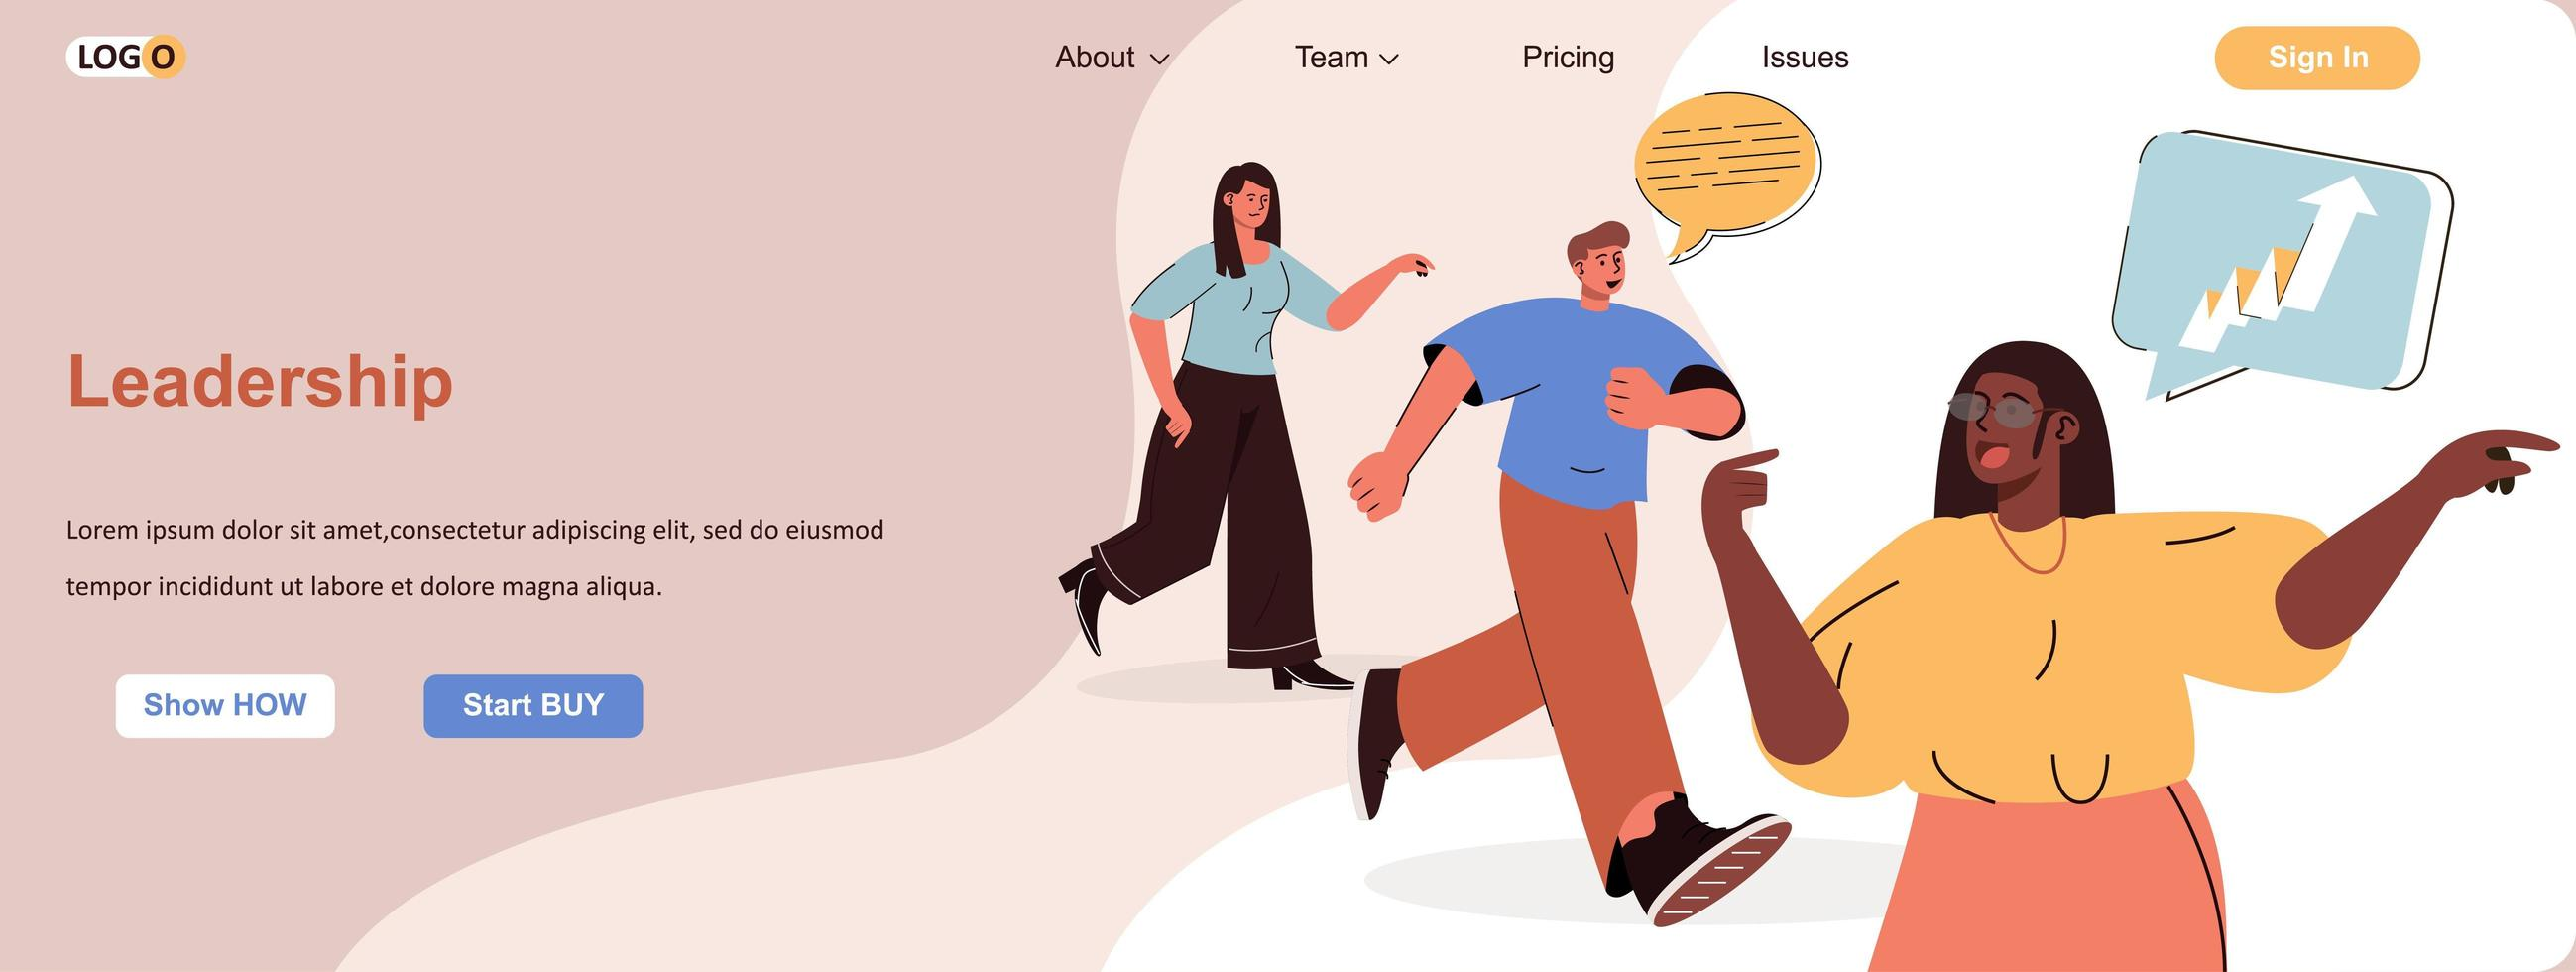 Leadership web banner for social media promotional materials vector